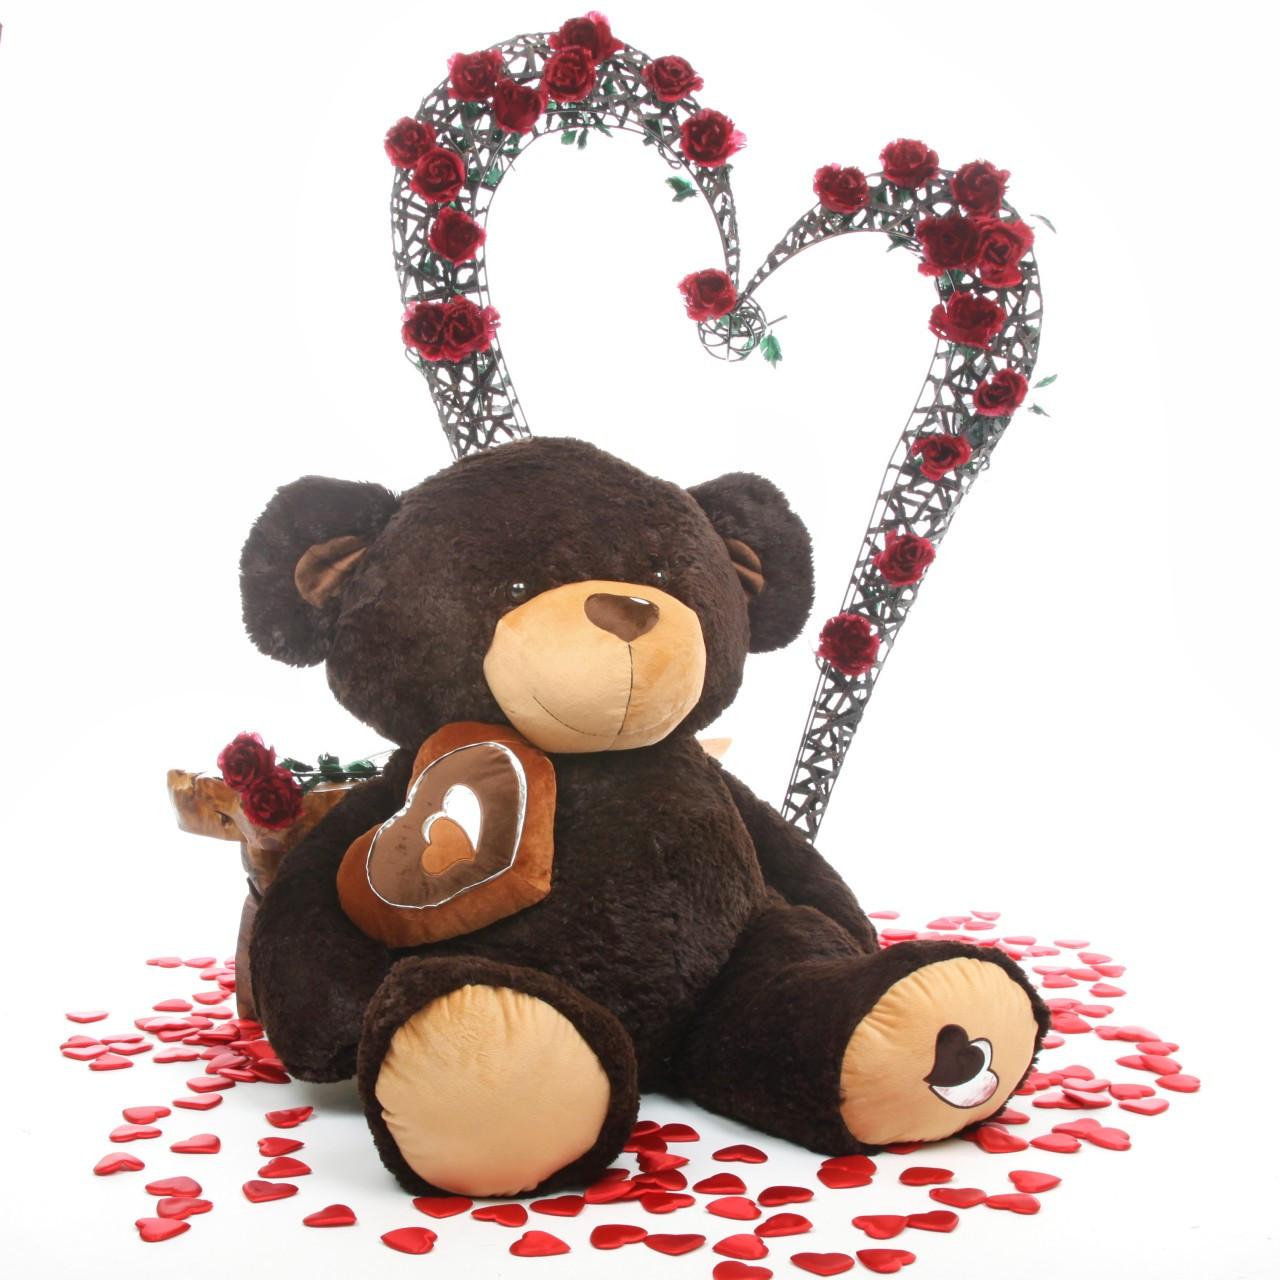 4ft Enormous Chocolate Brown Sugar Pie Big Love Teddy Bear